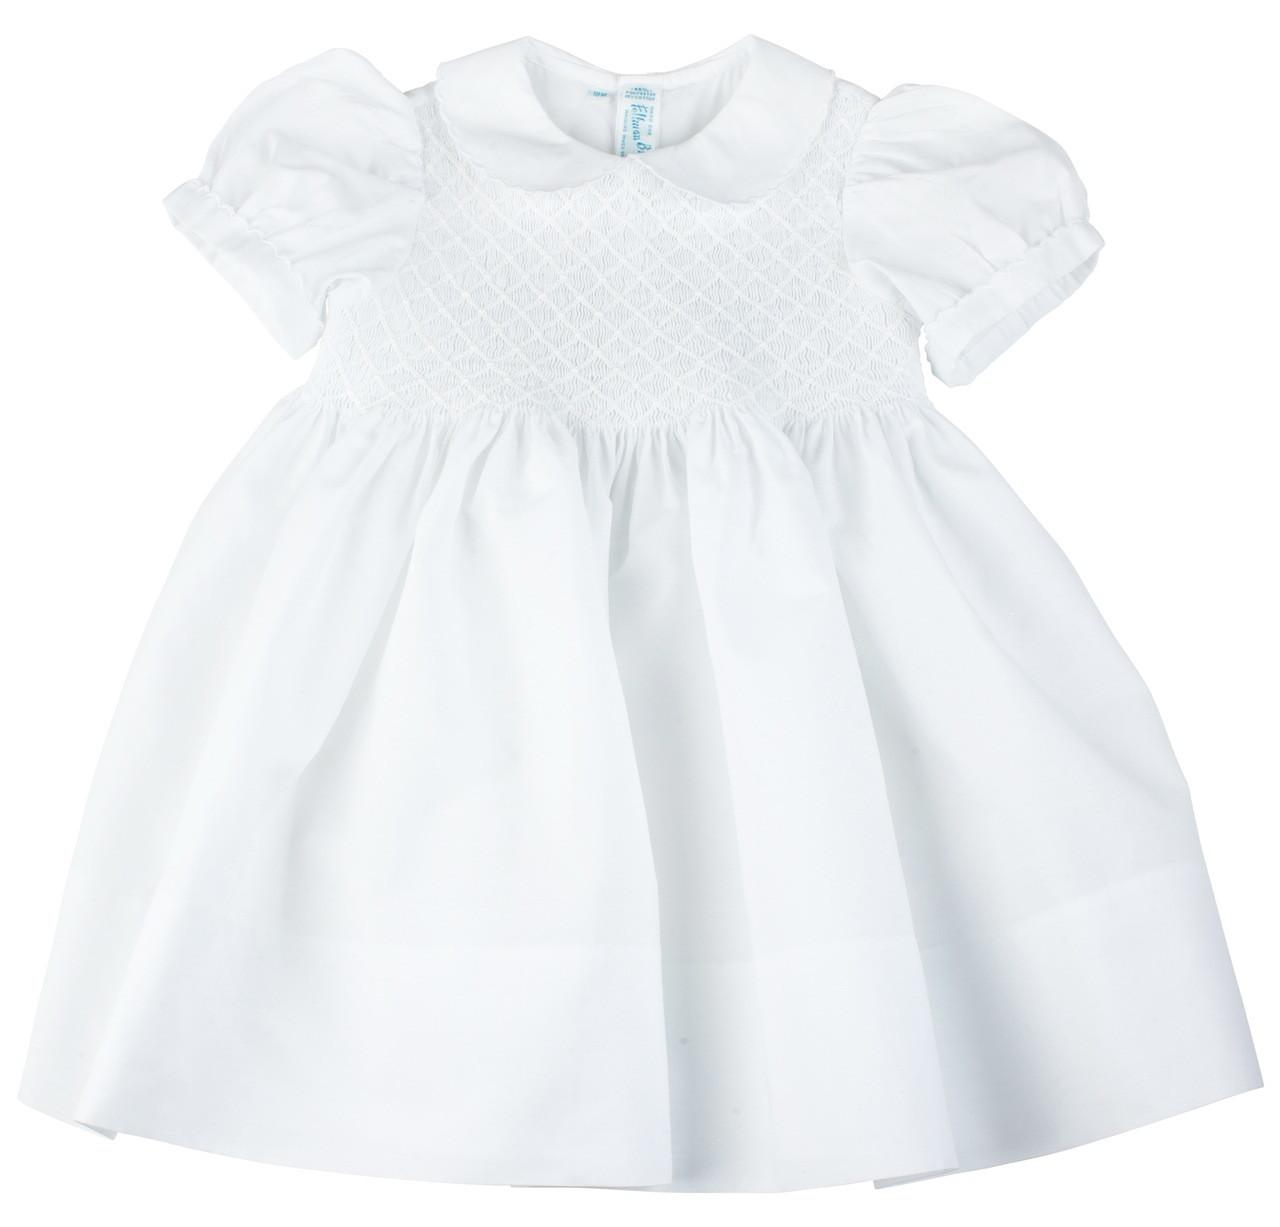 White Smocked Dress JeP5jbtn